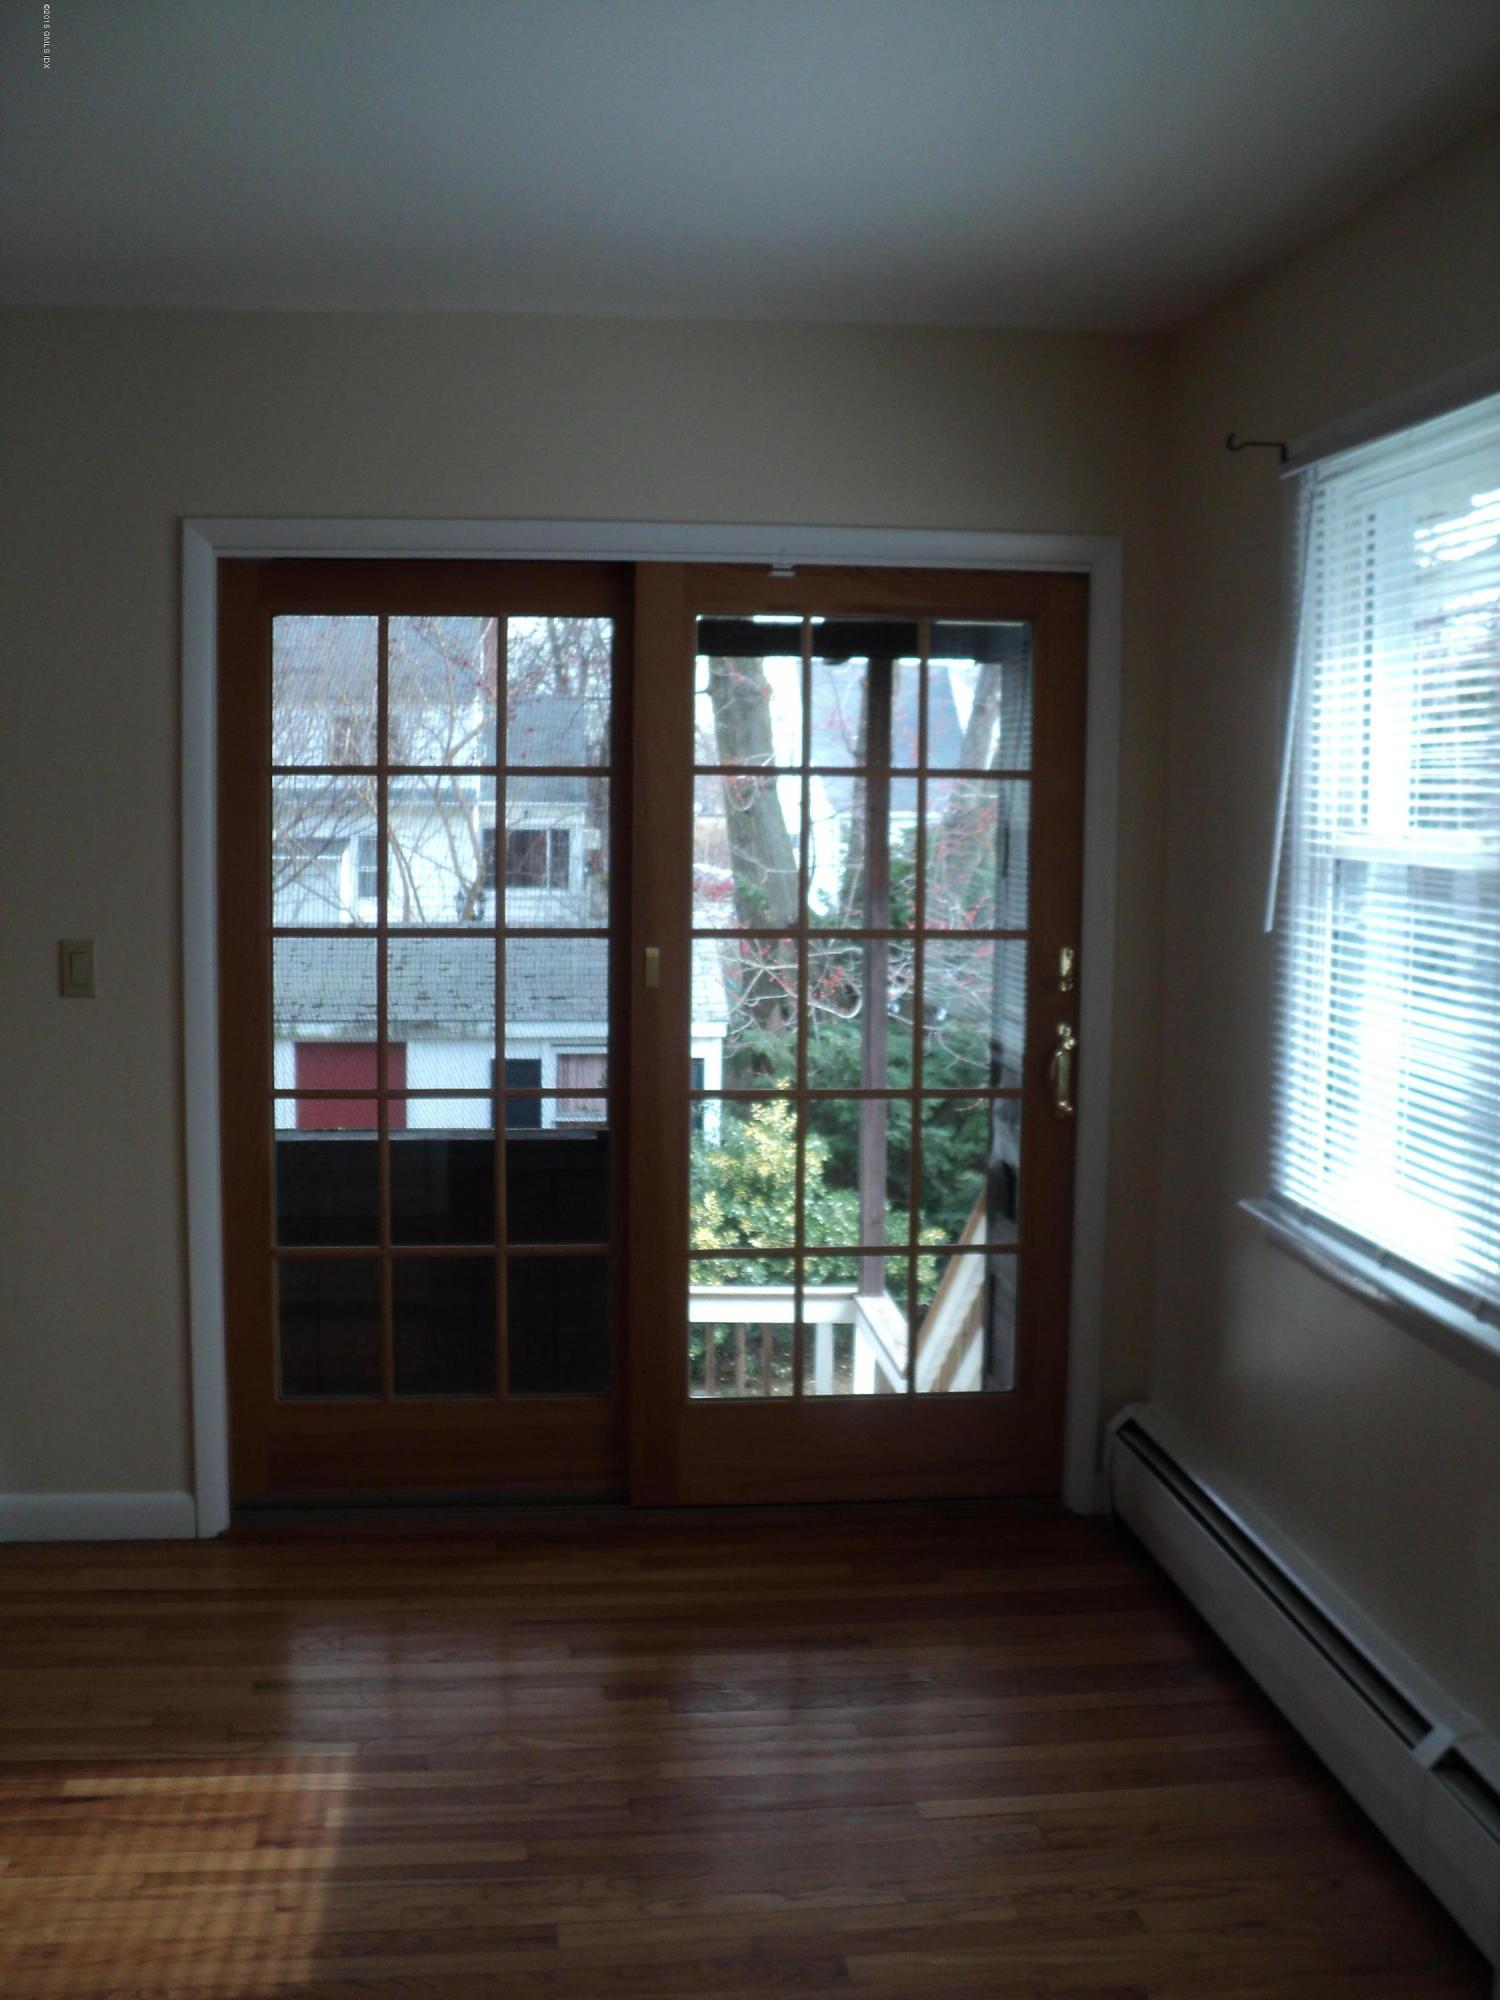 36 7Th Street, #1, Stamford, CT 06905